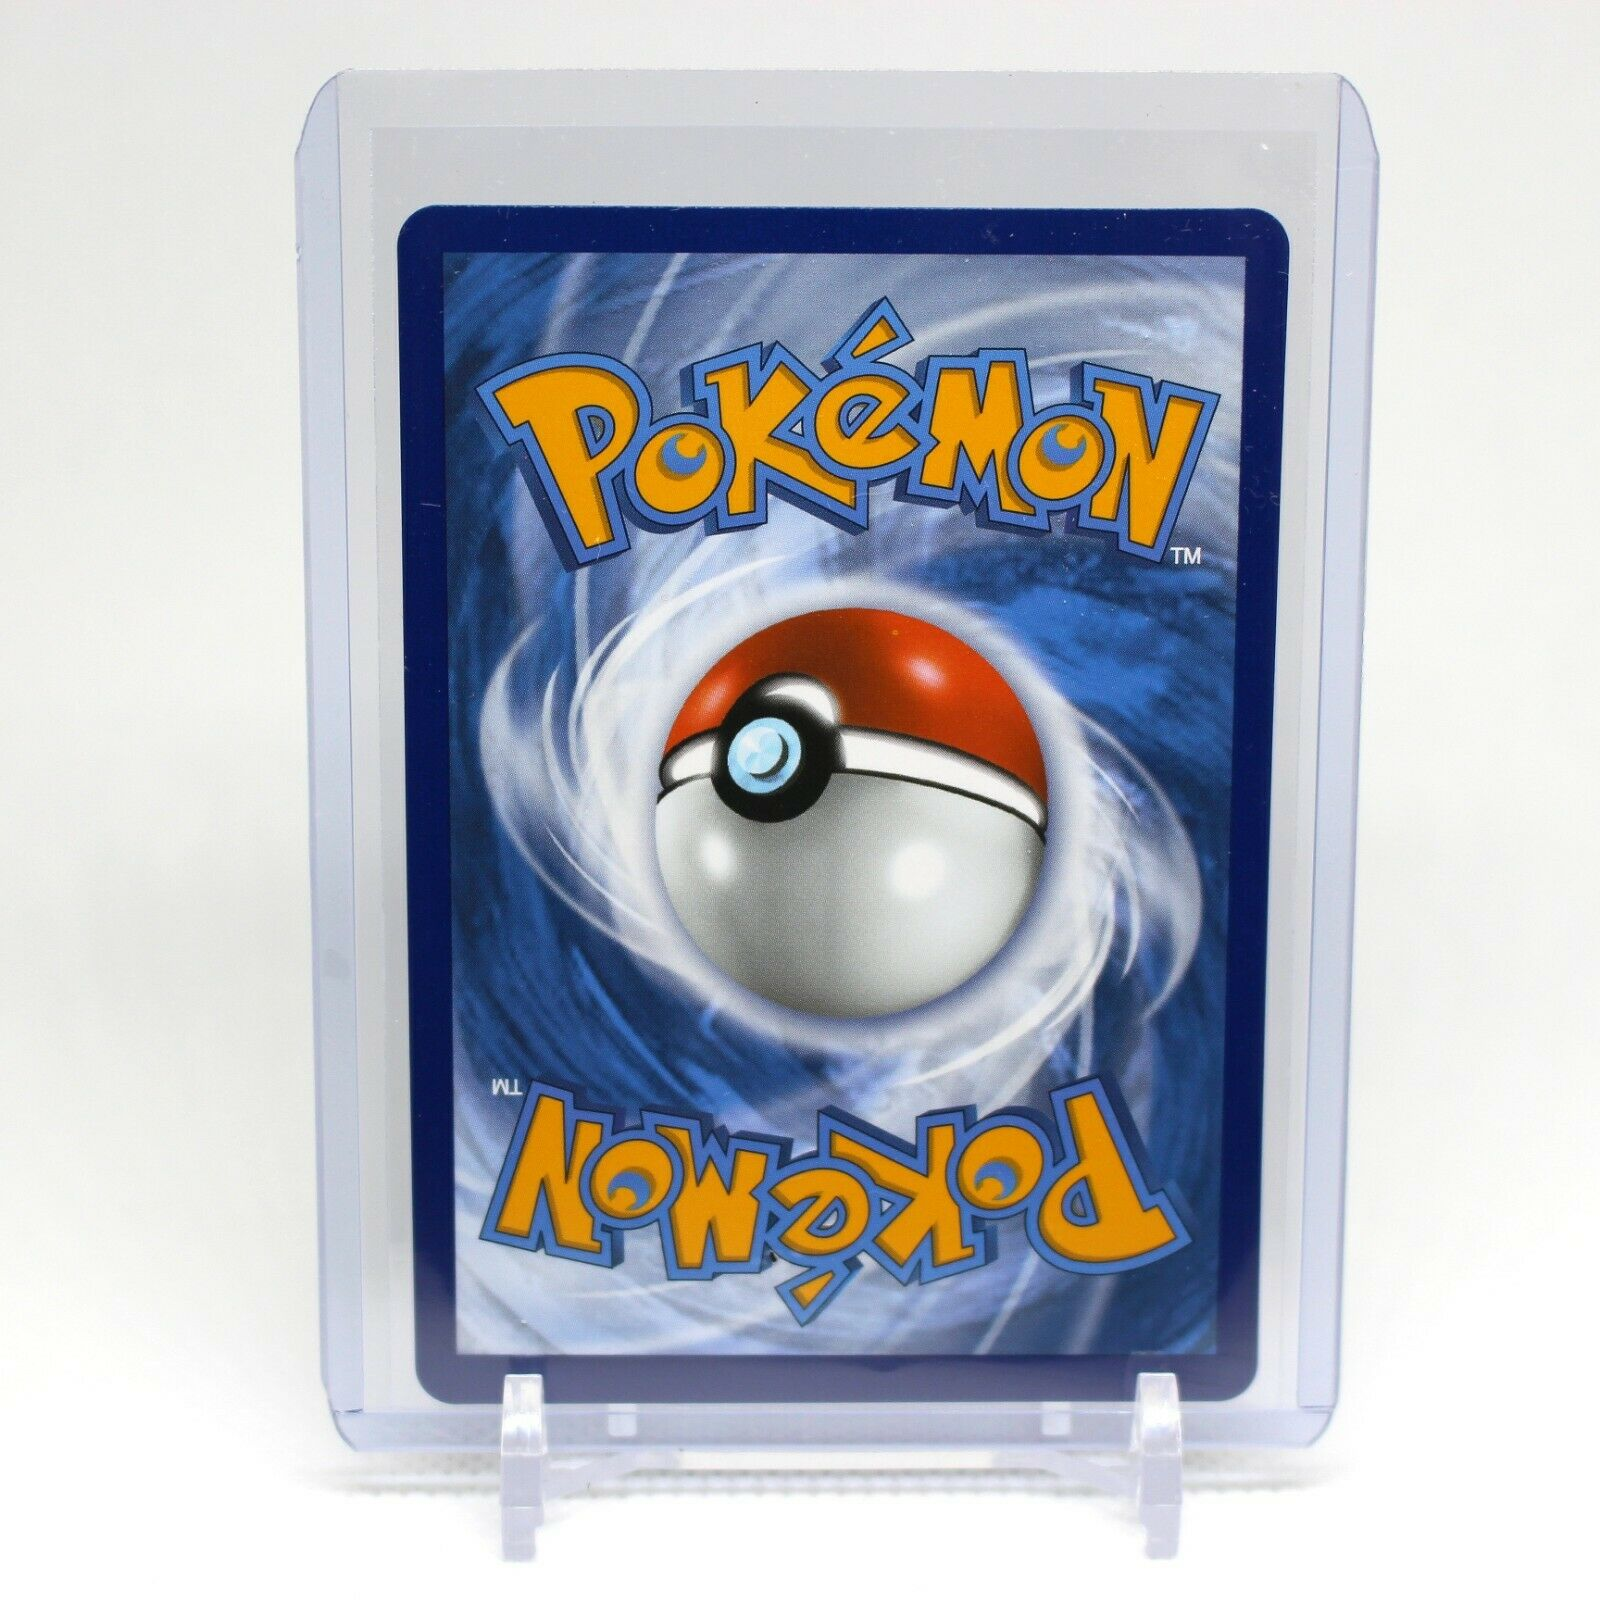 Blaziken VMAX 021/198 Pokémon TCG Chilling Reign Full Art Ultra Rare M/NM - Image 2